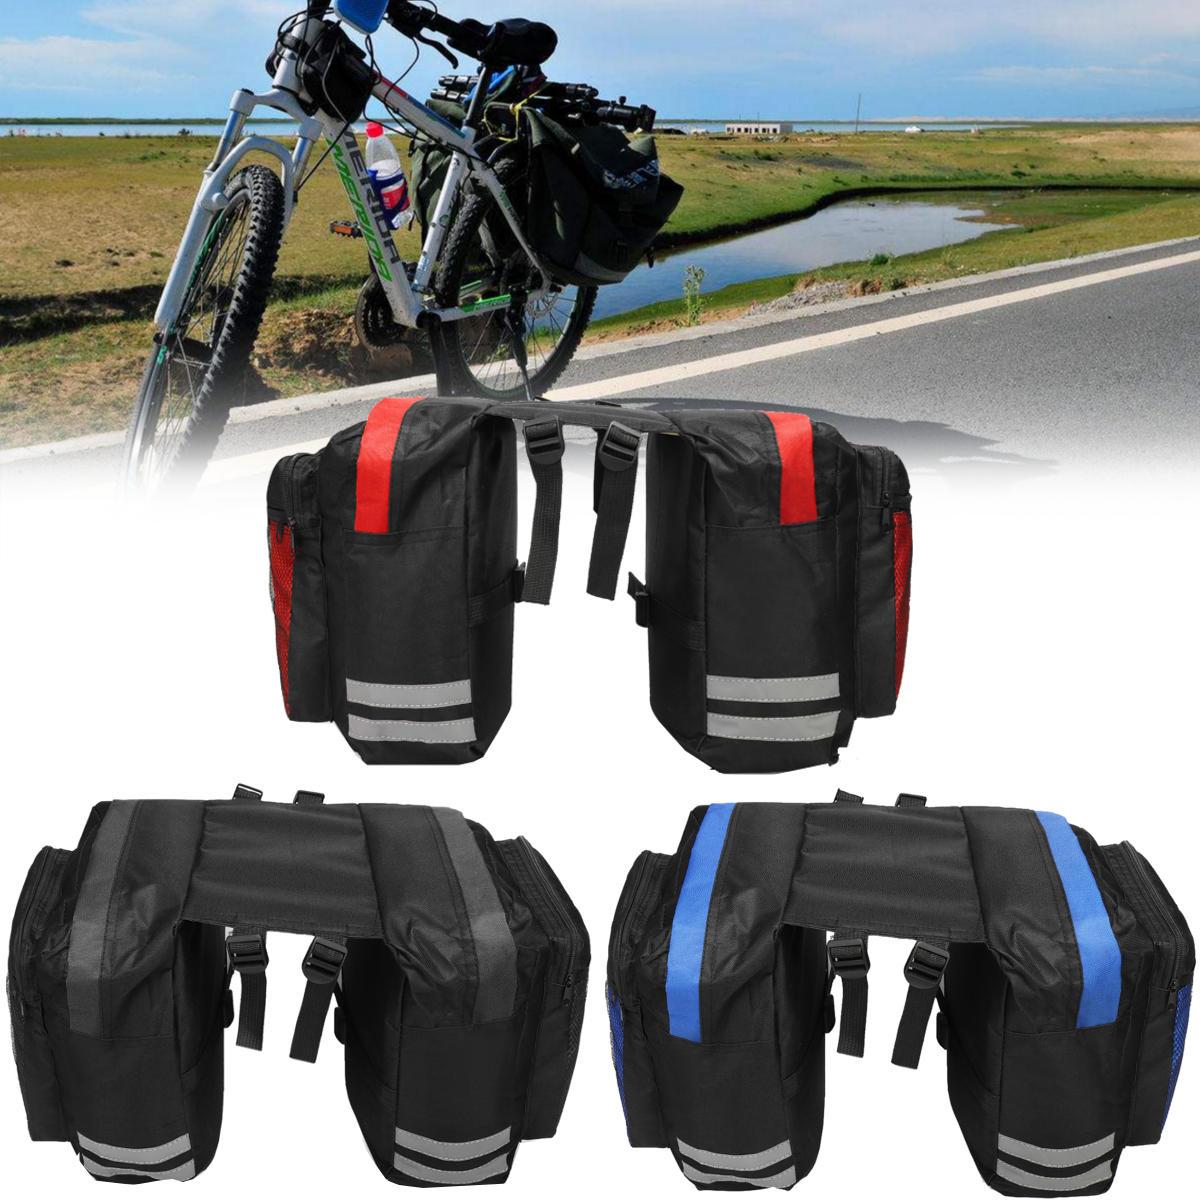 BIKIGHT Bicicleta de ciclismo 600D 20L Equipaje Bolsa Bicicleta de asiento trasero con asiento Saddle Bolsa Cycle Pannier Impermeable